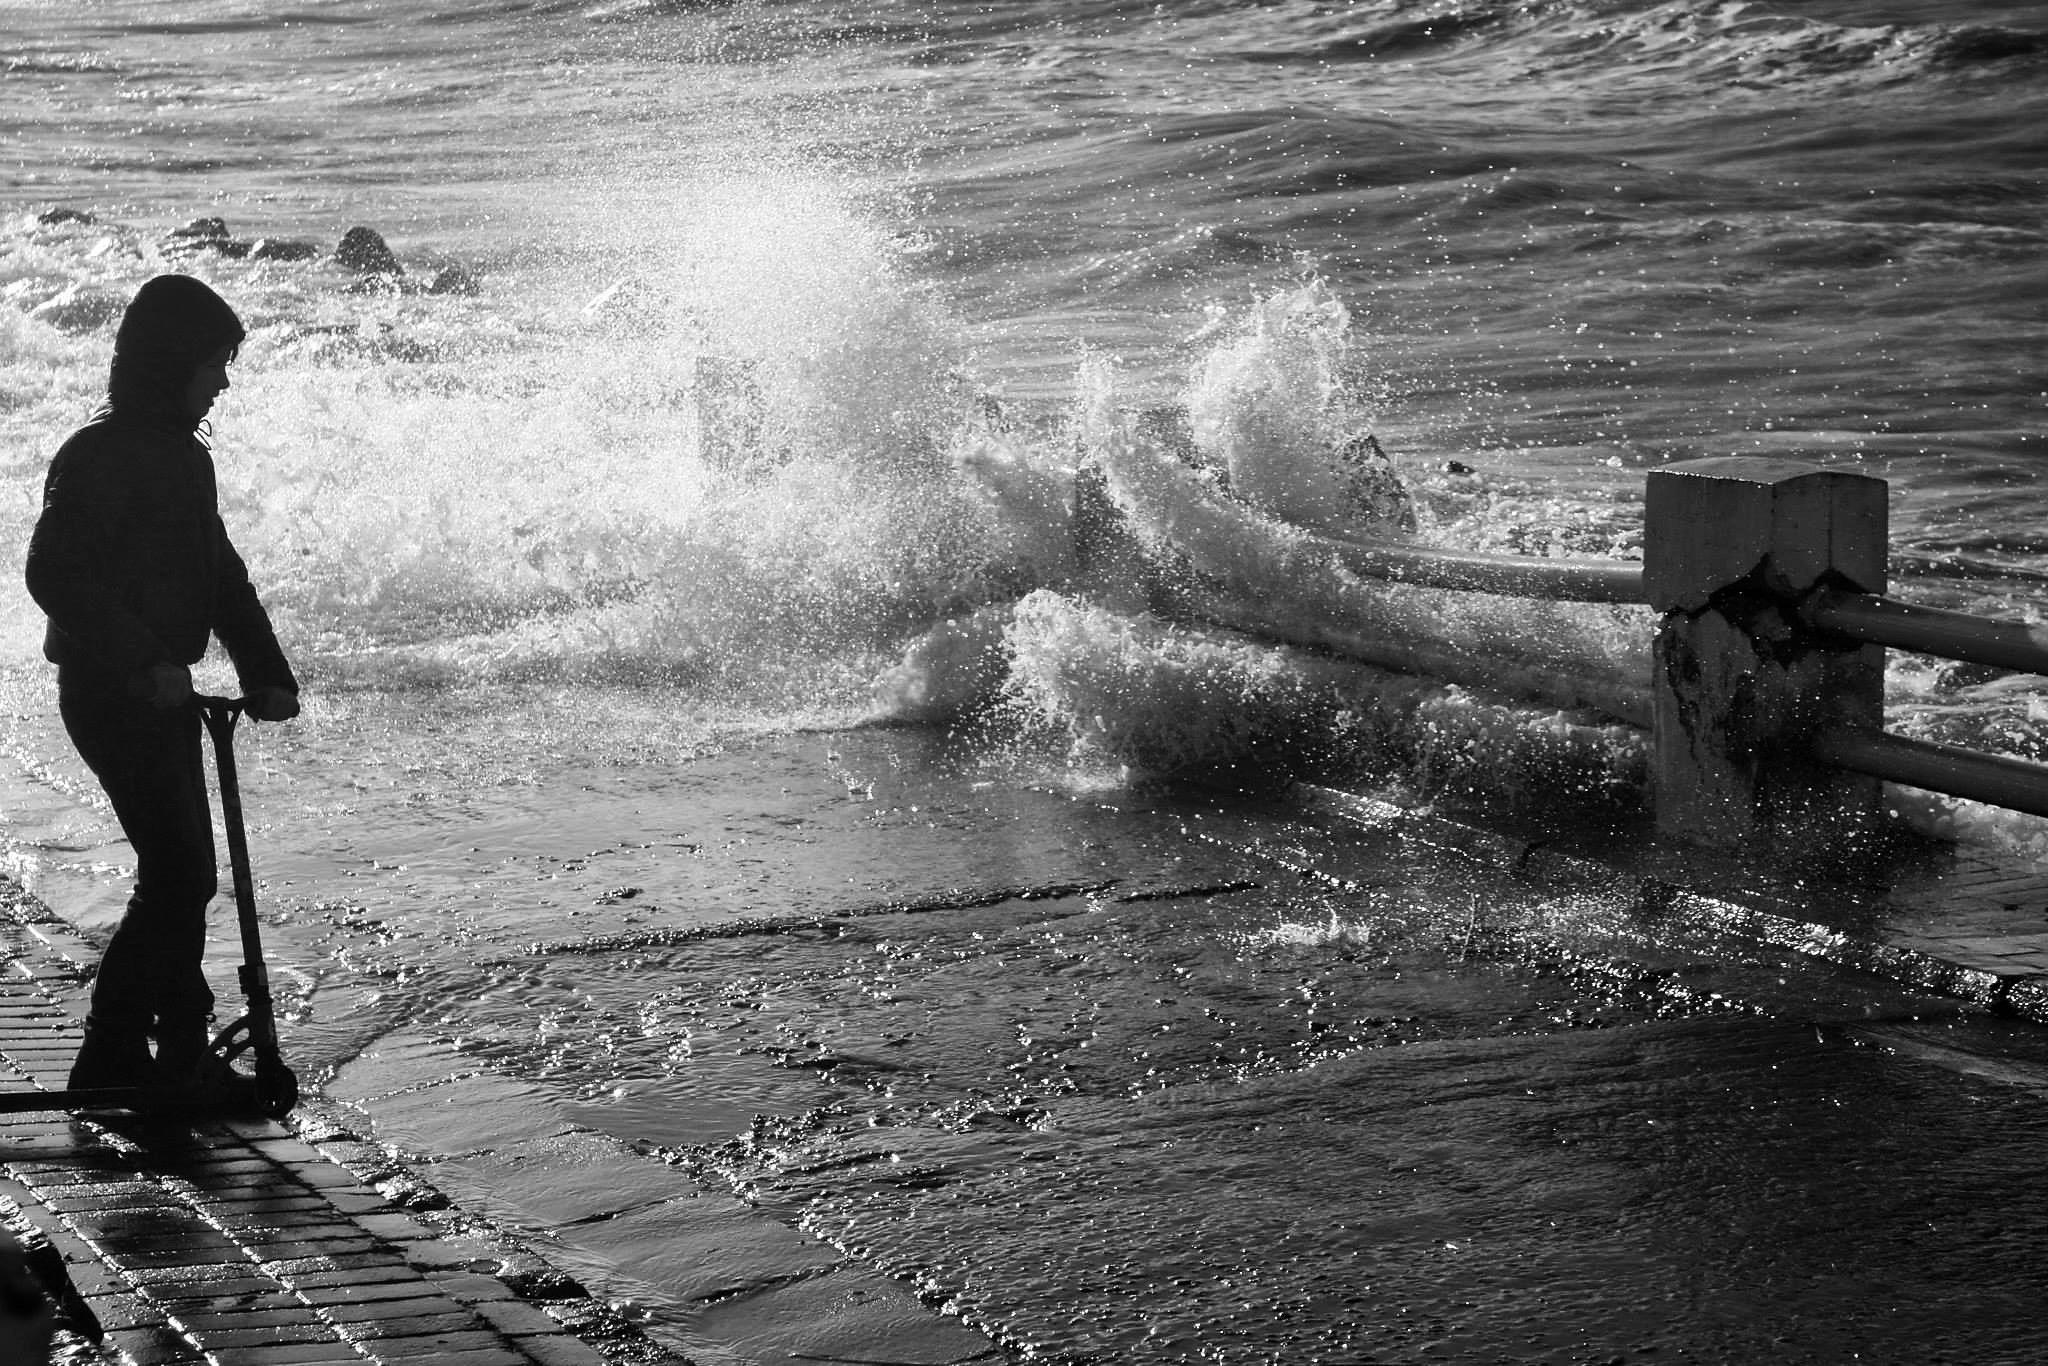 ~esperando la próxima ola~ by Valeria Di Meglio